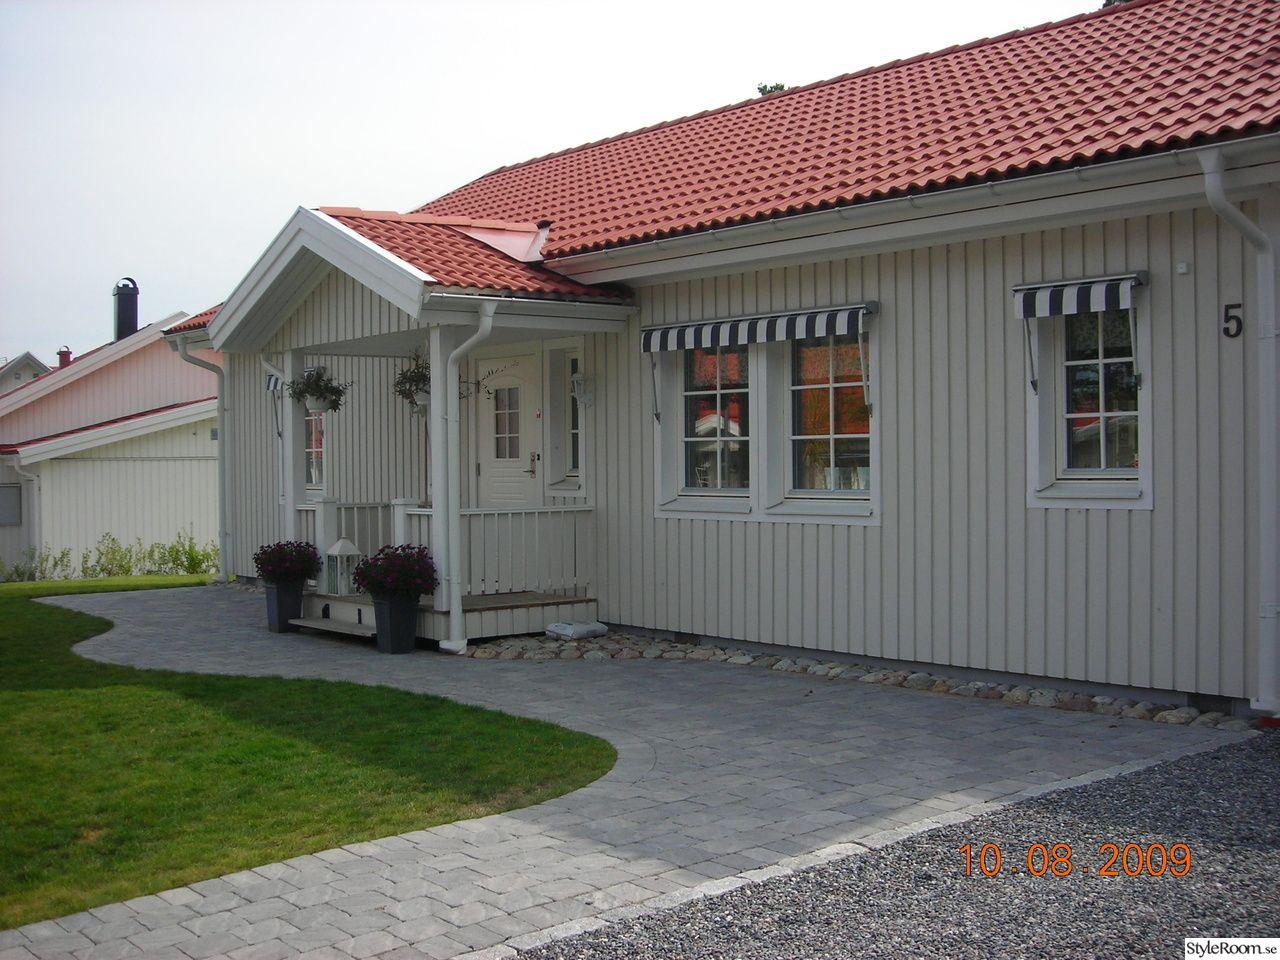 framsidan av huset | Huset | Pinterest : beckers silikatfärg : Inredning